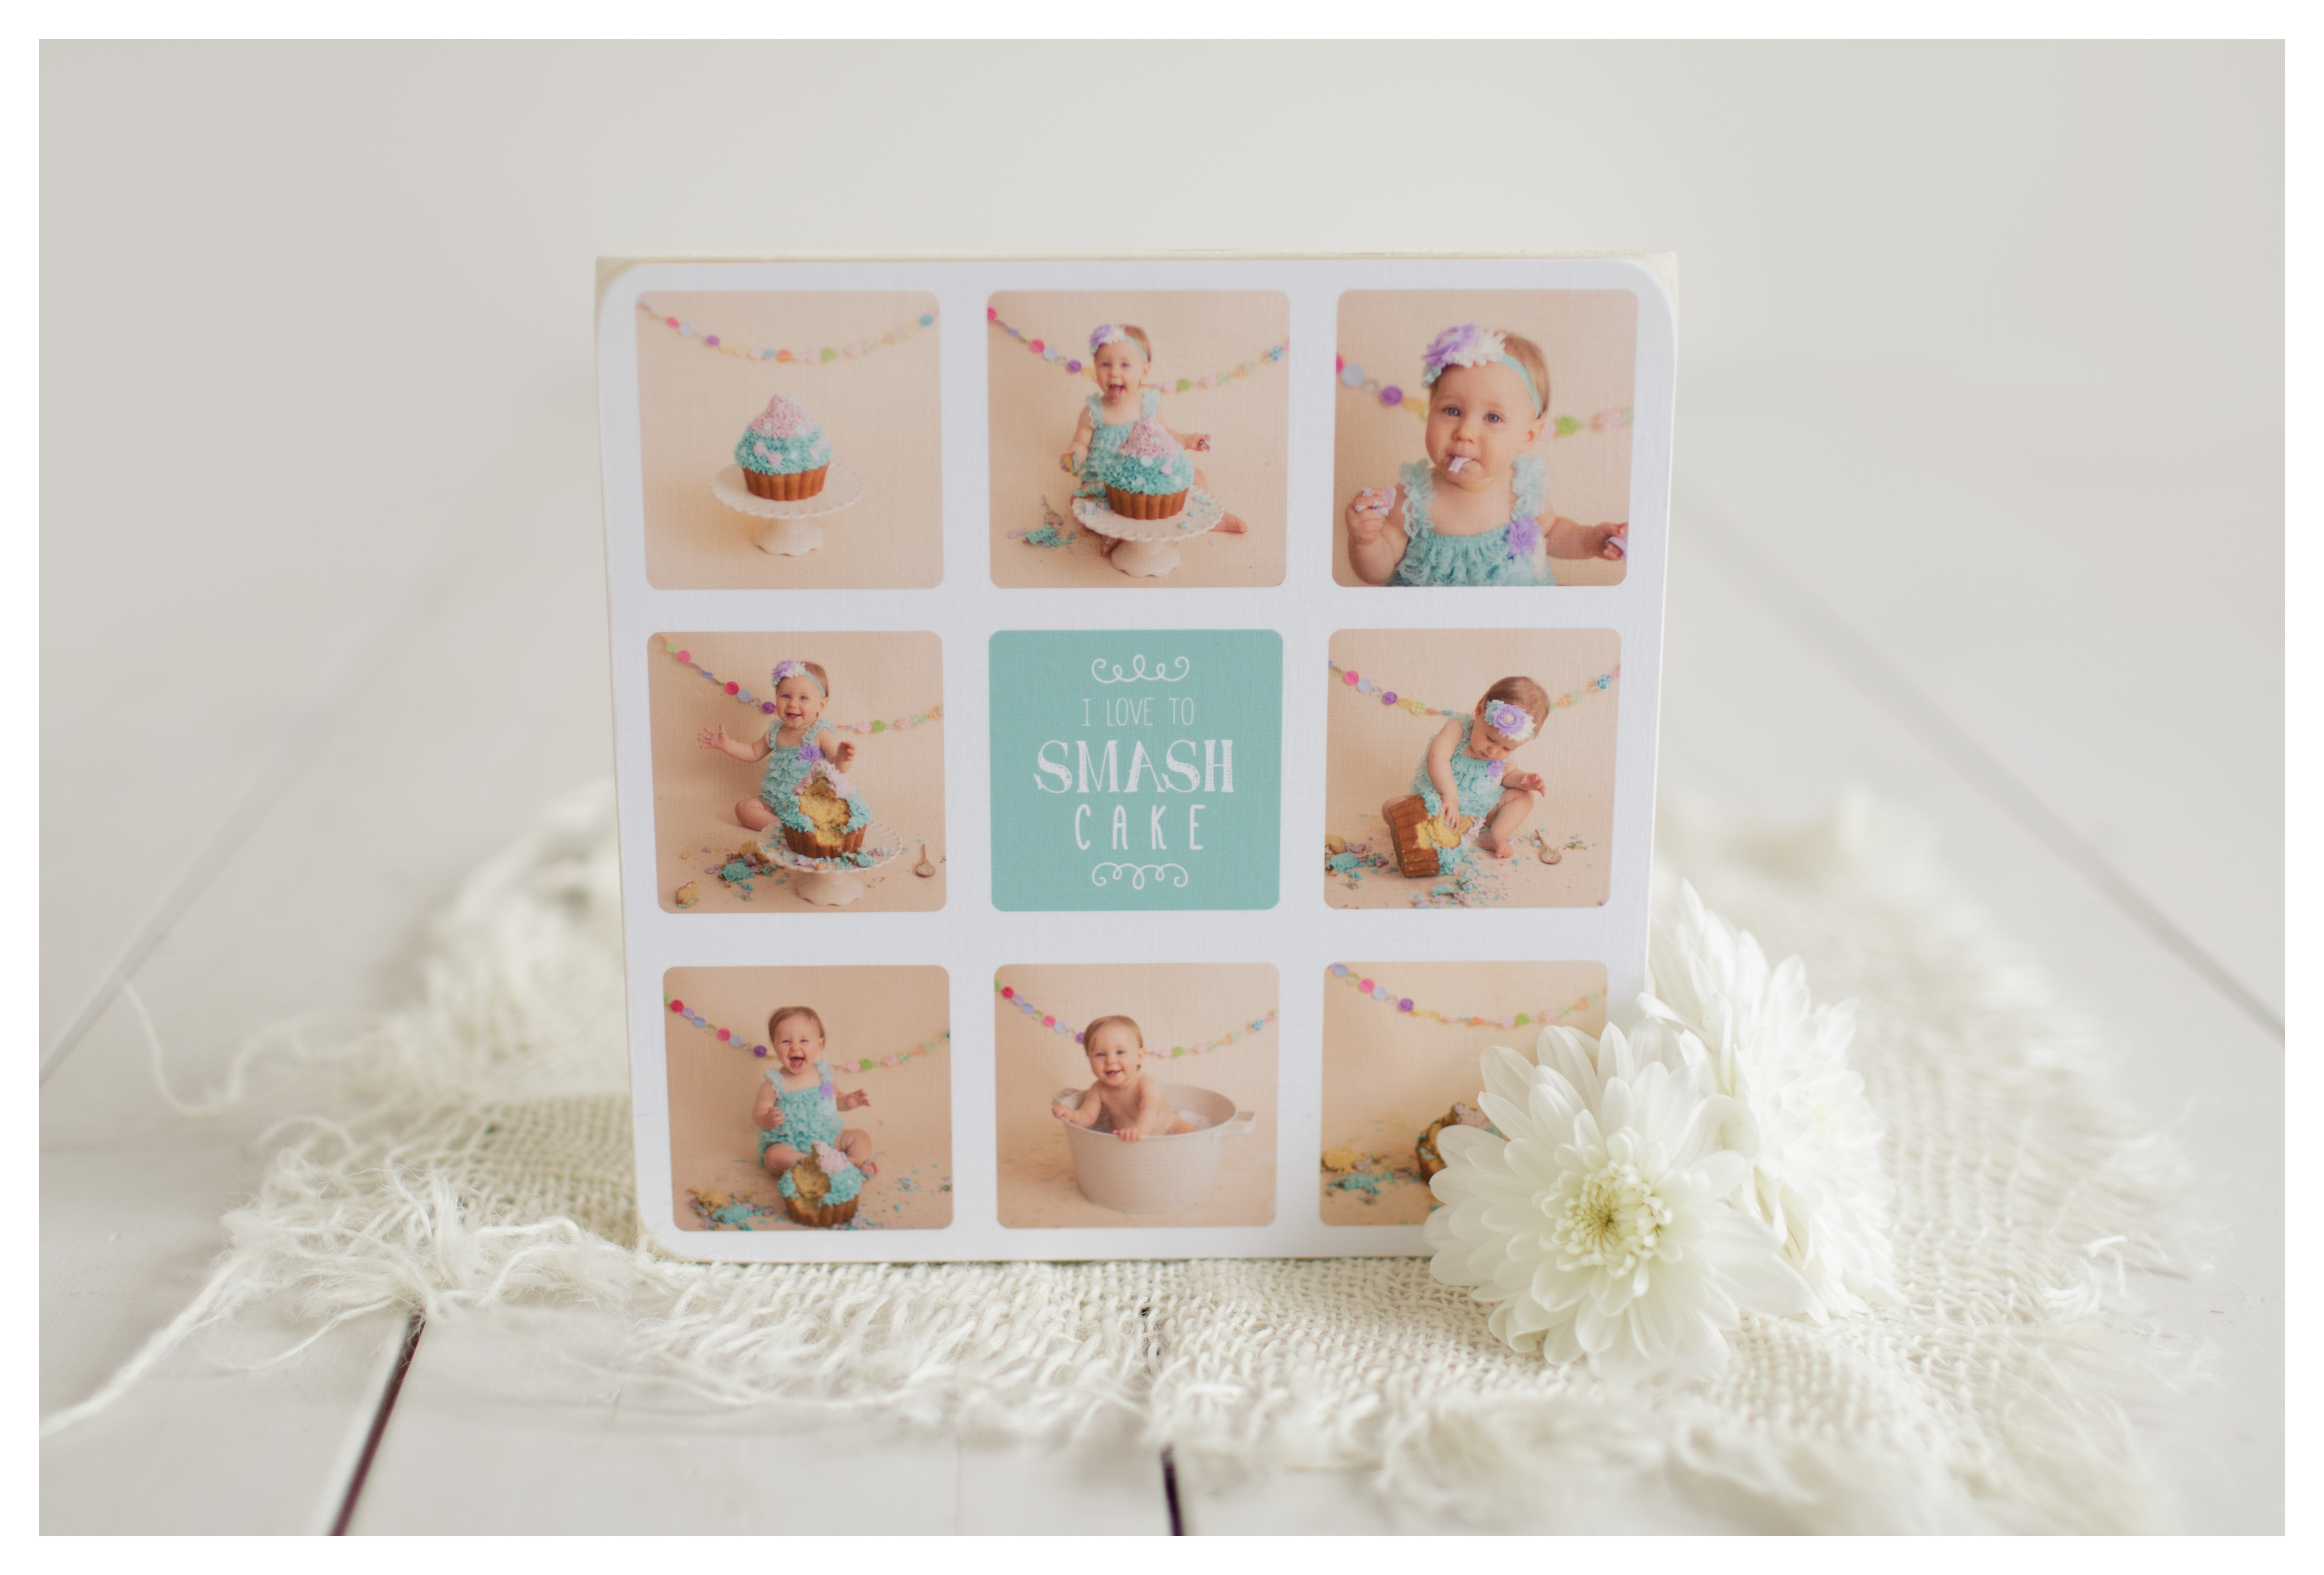 Peterborough Baby Photographer | Sweet Baby Photography | http://sweetbaby.photography